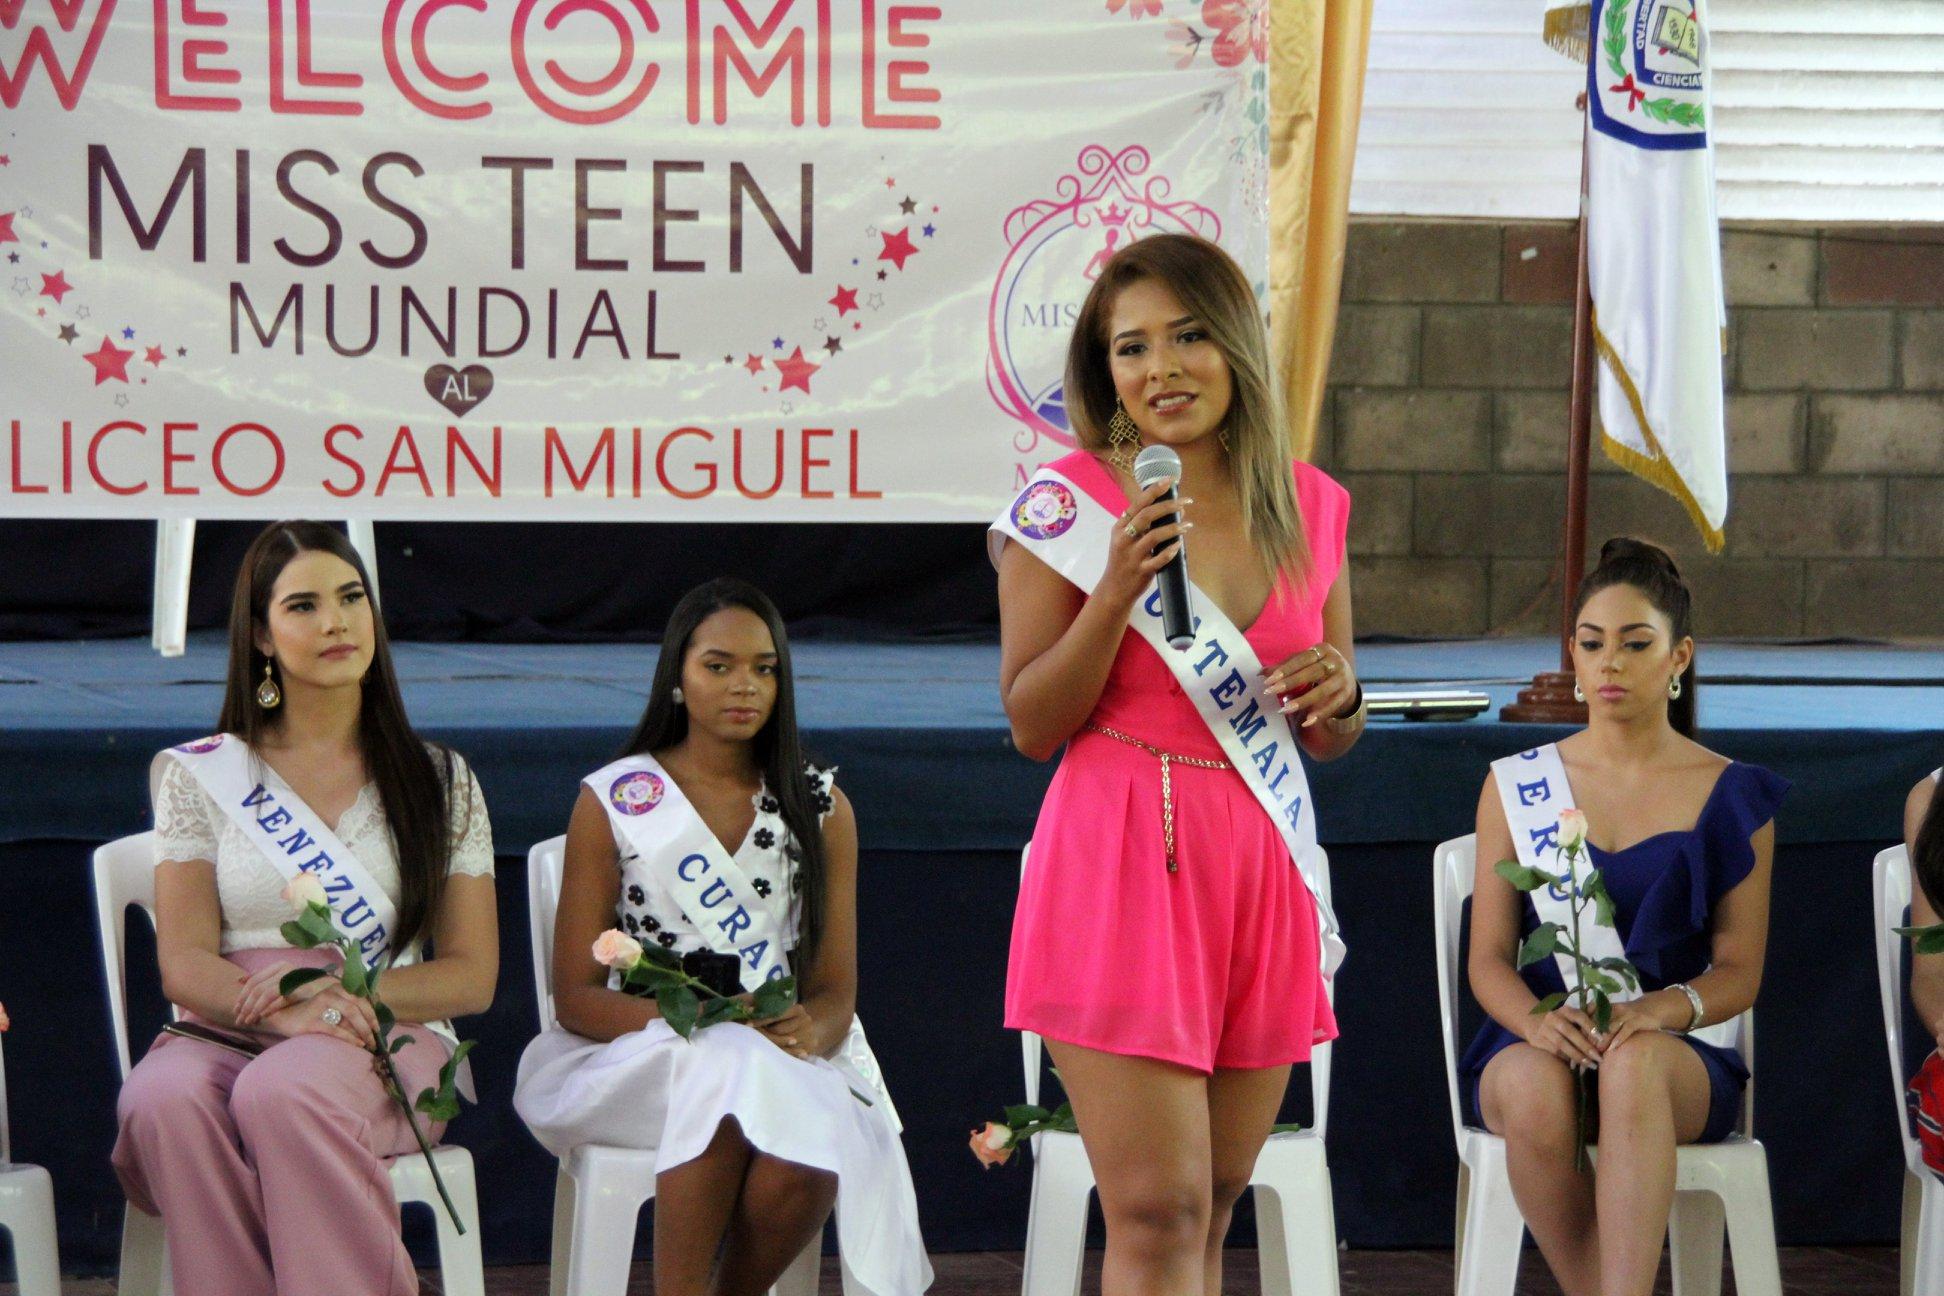 daniela di venere, top 12 de miss teen mundial 2019. - Página 6 60895610